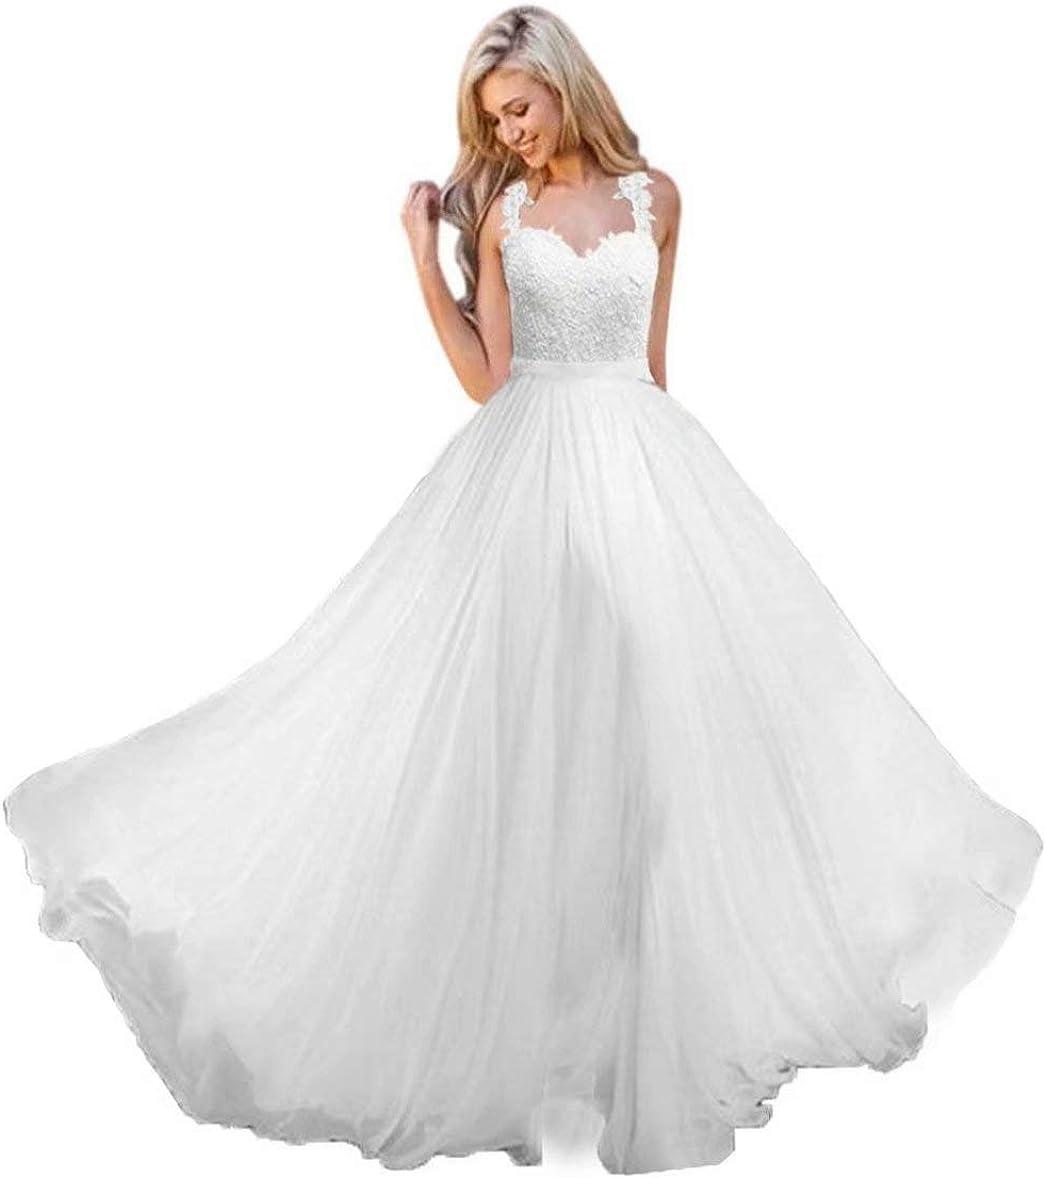 Andybridal A Line Spaghetti Straps Sweetheart Lace Chiffon Bridal Gowns Beach Wedding Dress